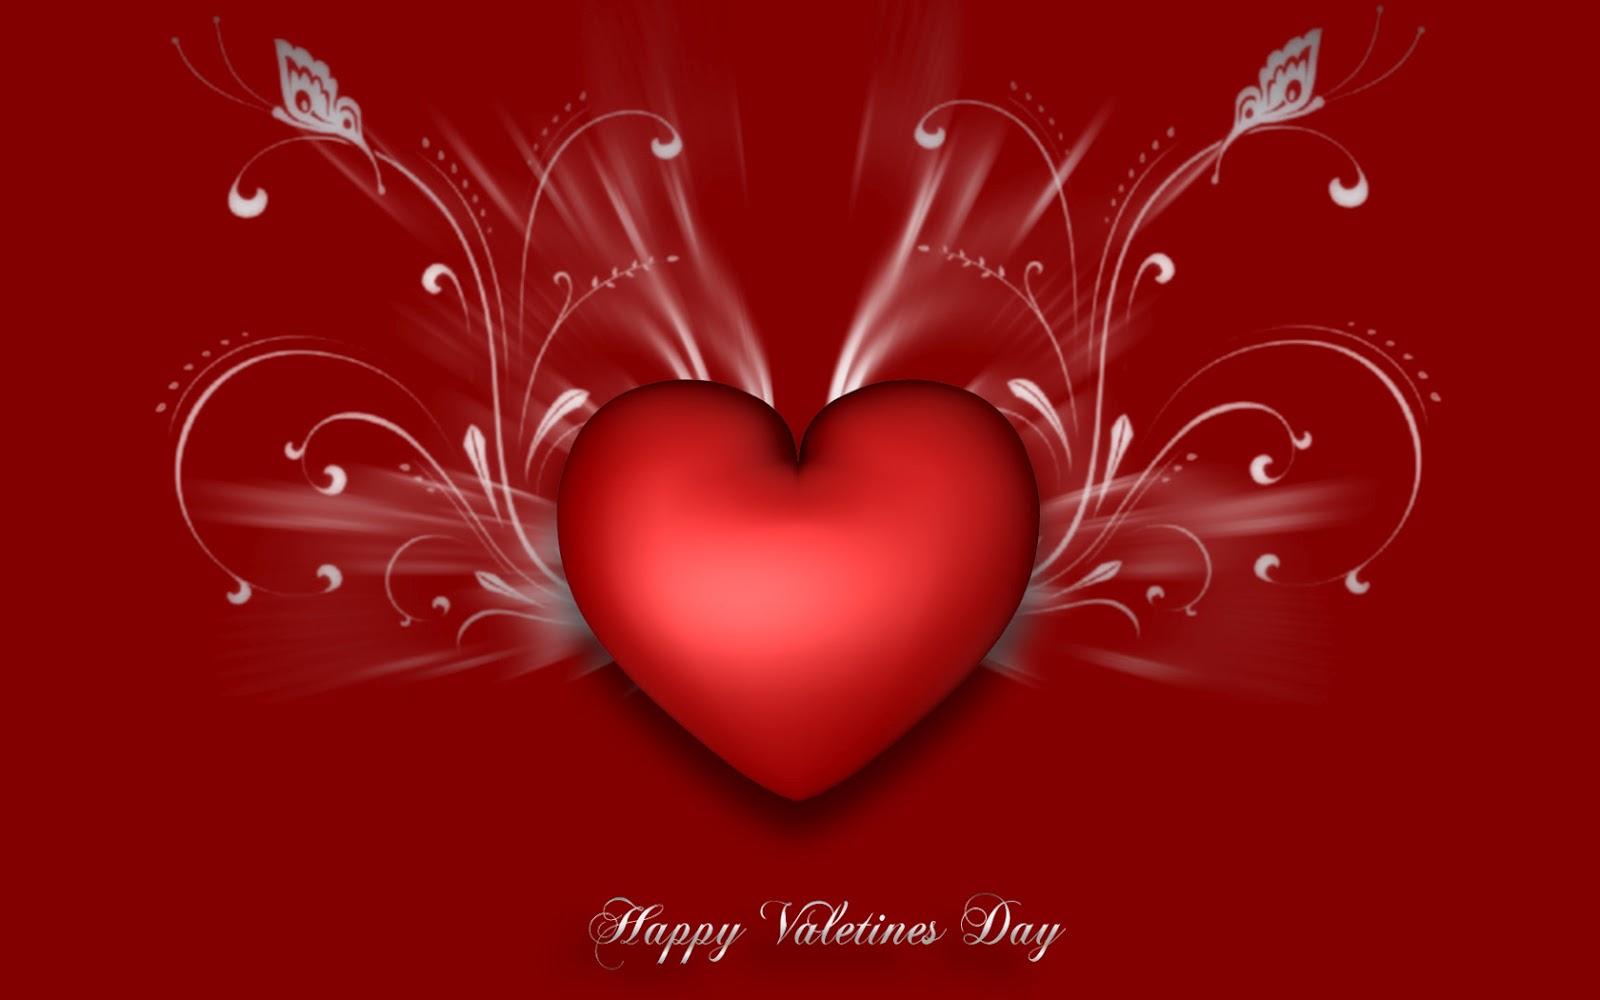 http://2.bp.blogspot.com/-7S2wfvU2xXY/TzbLd569epI/AAAAAAAAAMU/SFdUB4YYHZI/s1600/free-valentine-039-s-day-wallpaper-wallpaper_1680x1050_89883.jpg